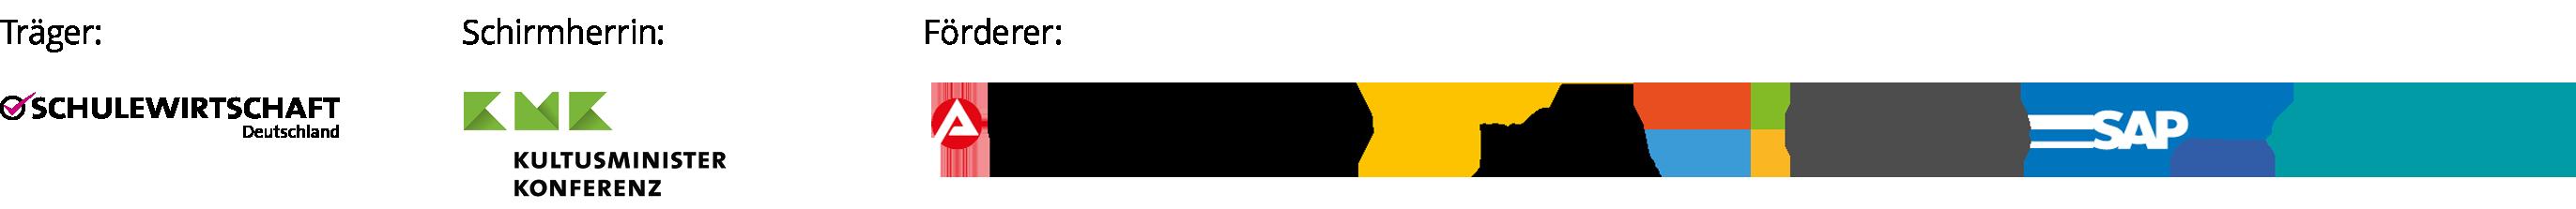 Berufswahlsiegel Akademie Logoleiste